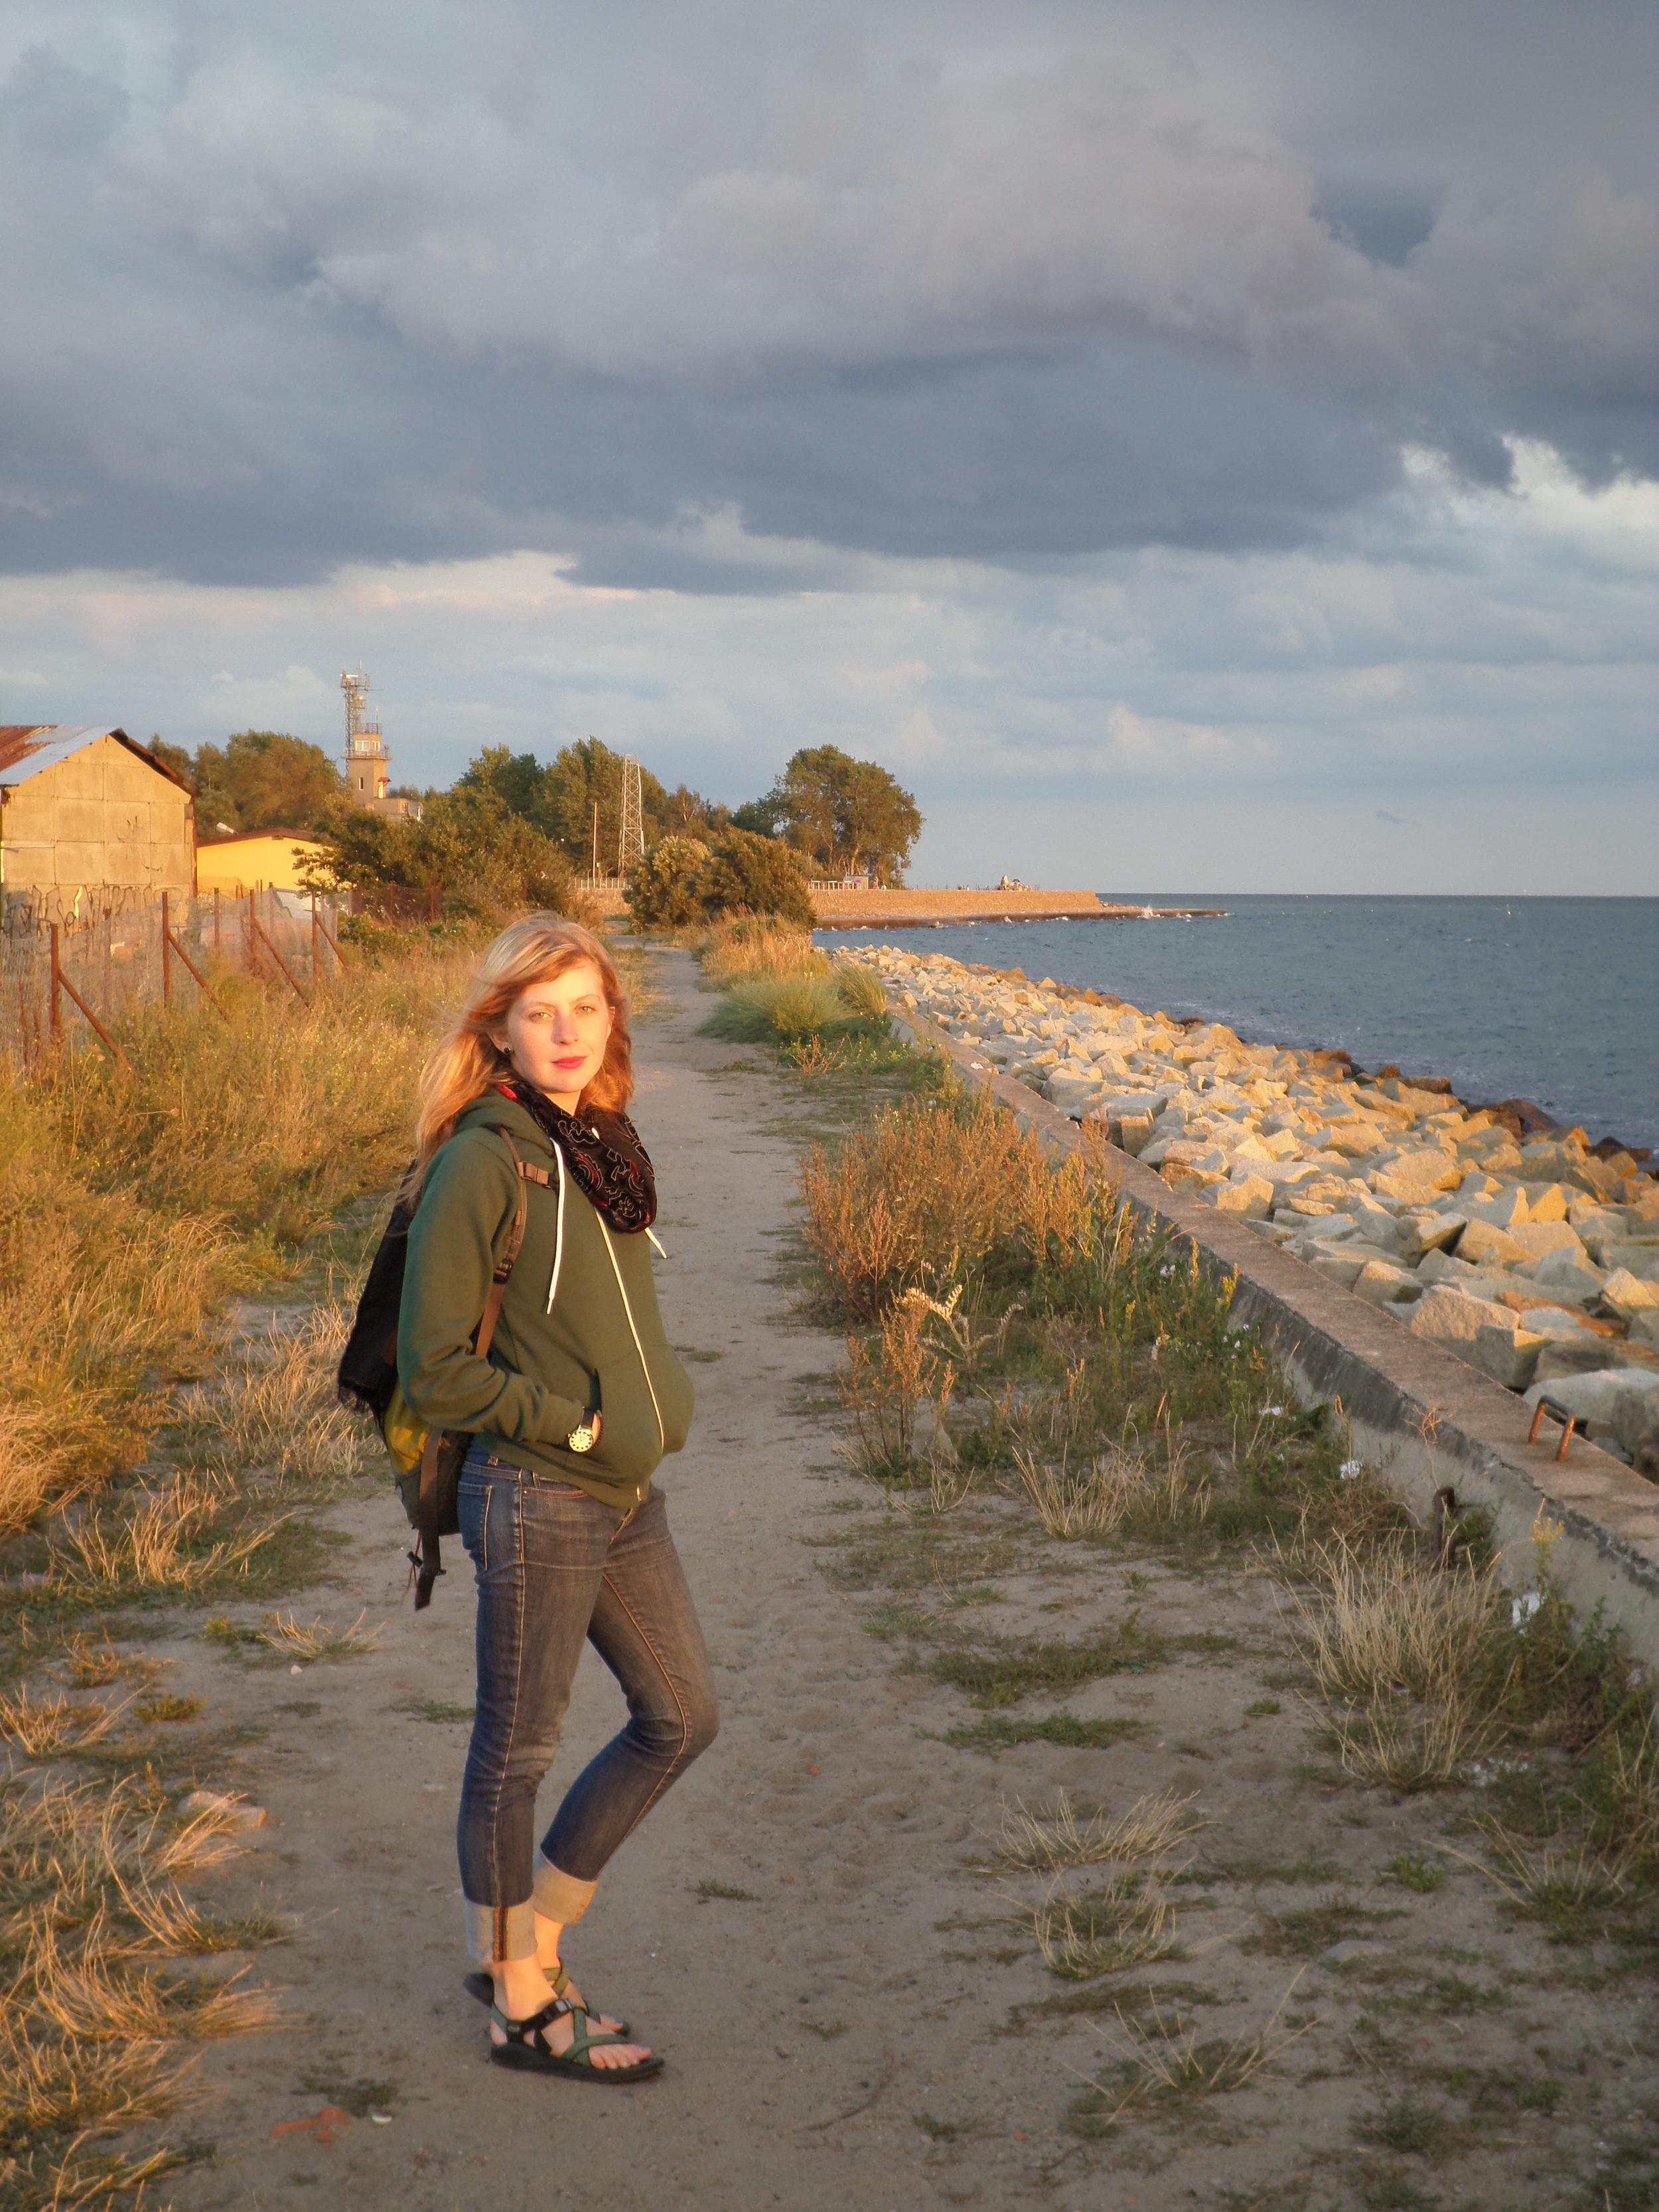 Cynthia enjoying the last rays of light in Hel, Poland